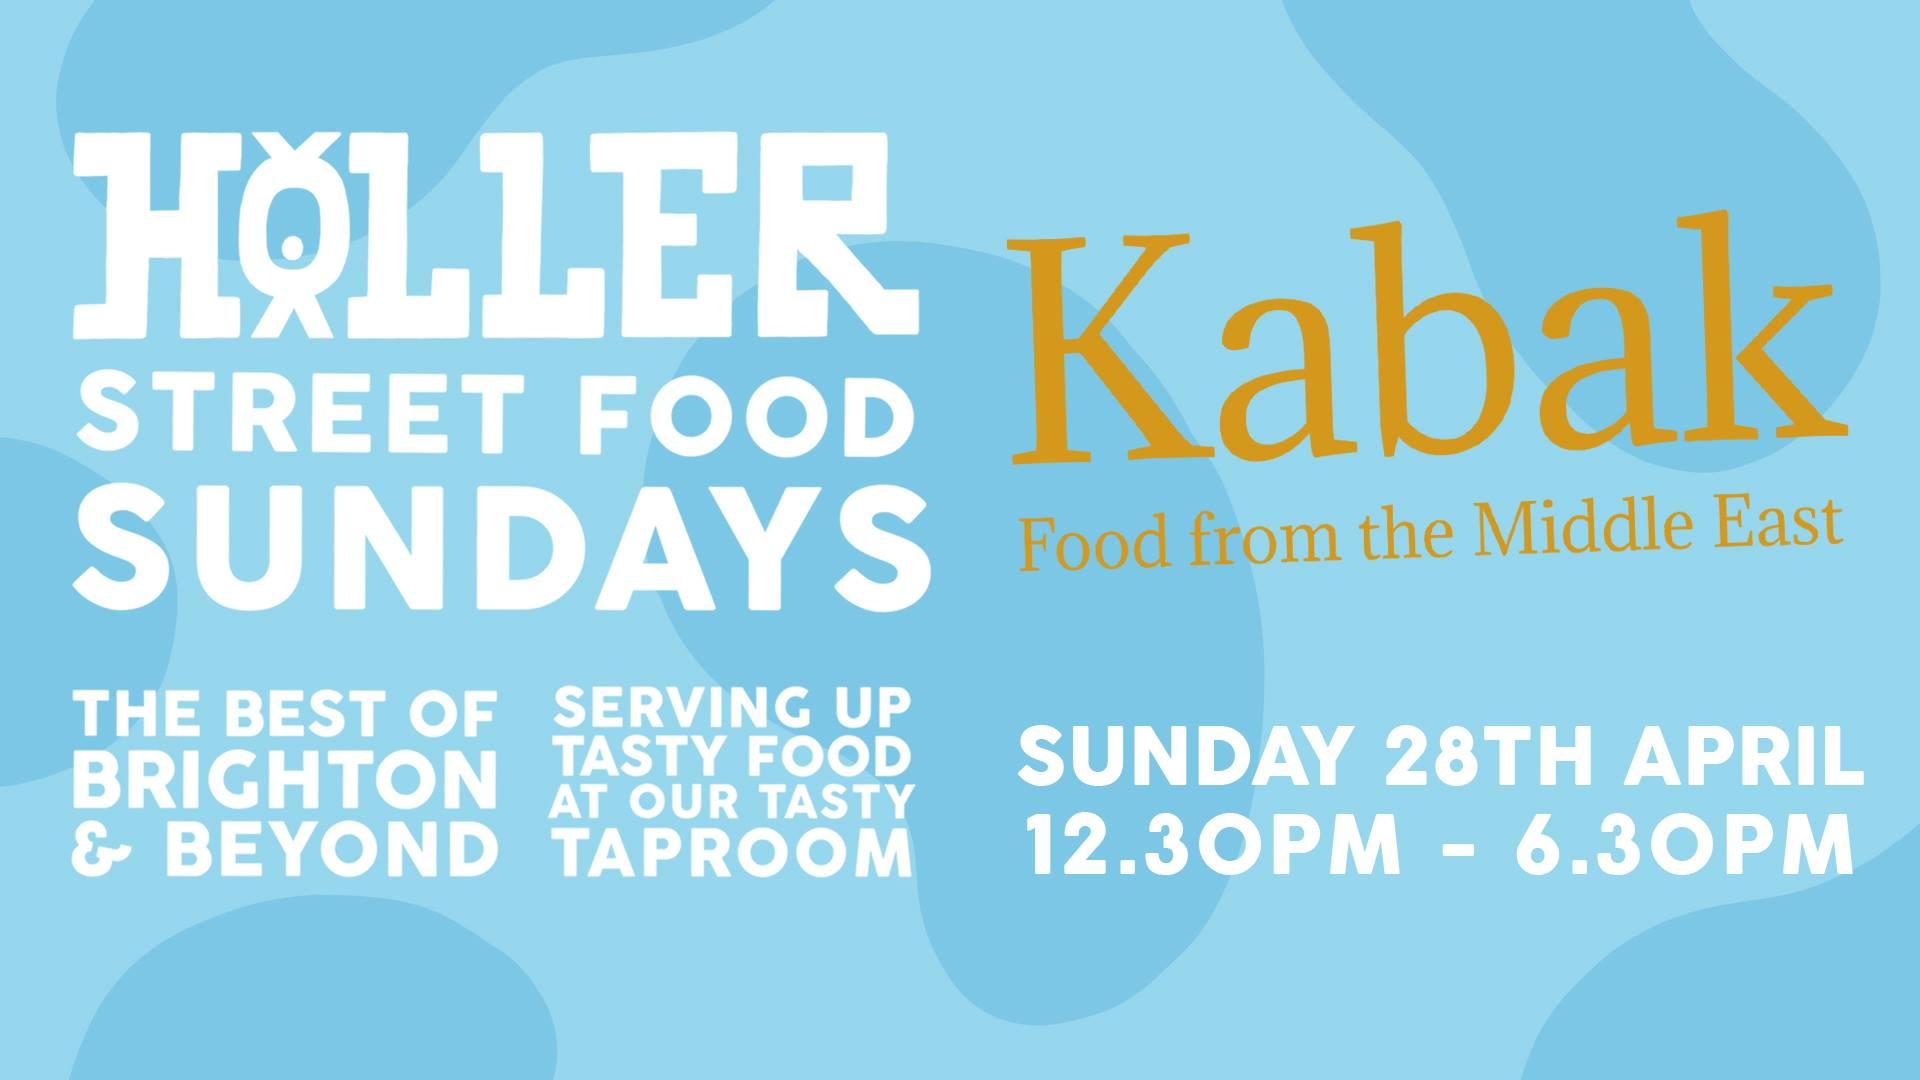 Holler-street-food-sundays-kabak-brighton-brewery-taproom.jpg